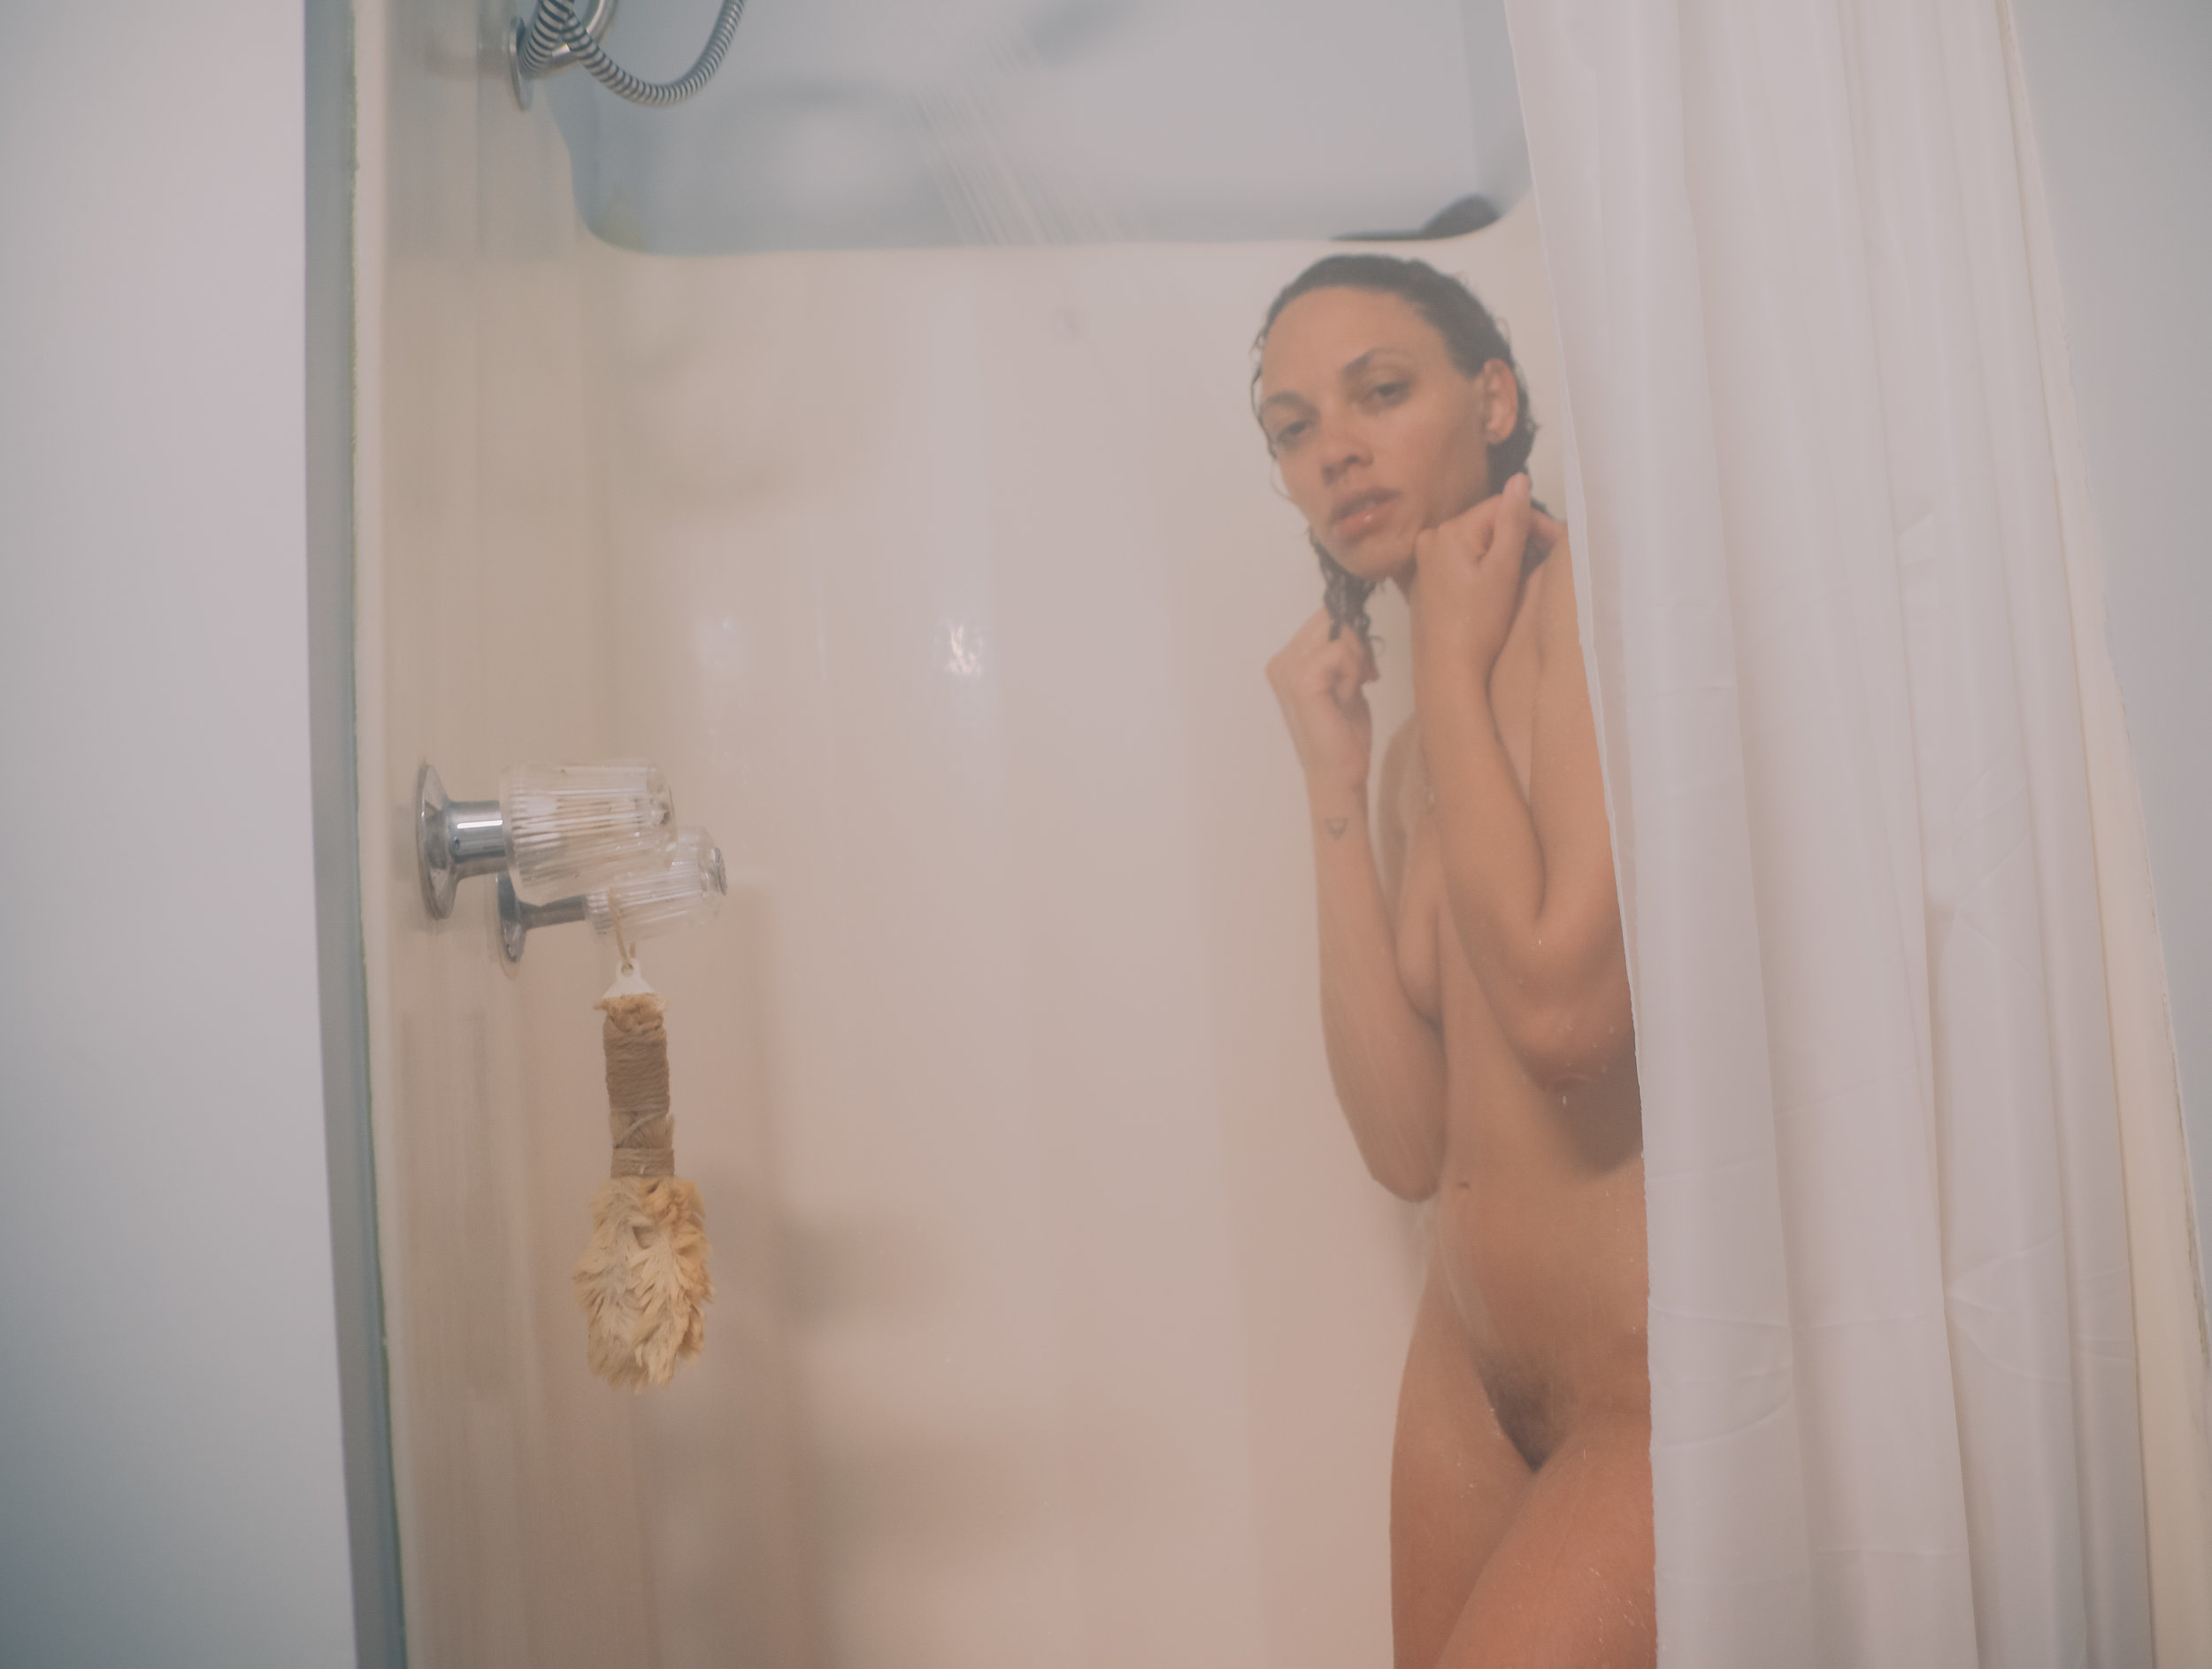 2019.03-Eunique Deeann-poetry-shower-18.jpg